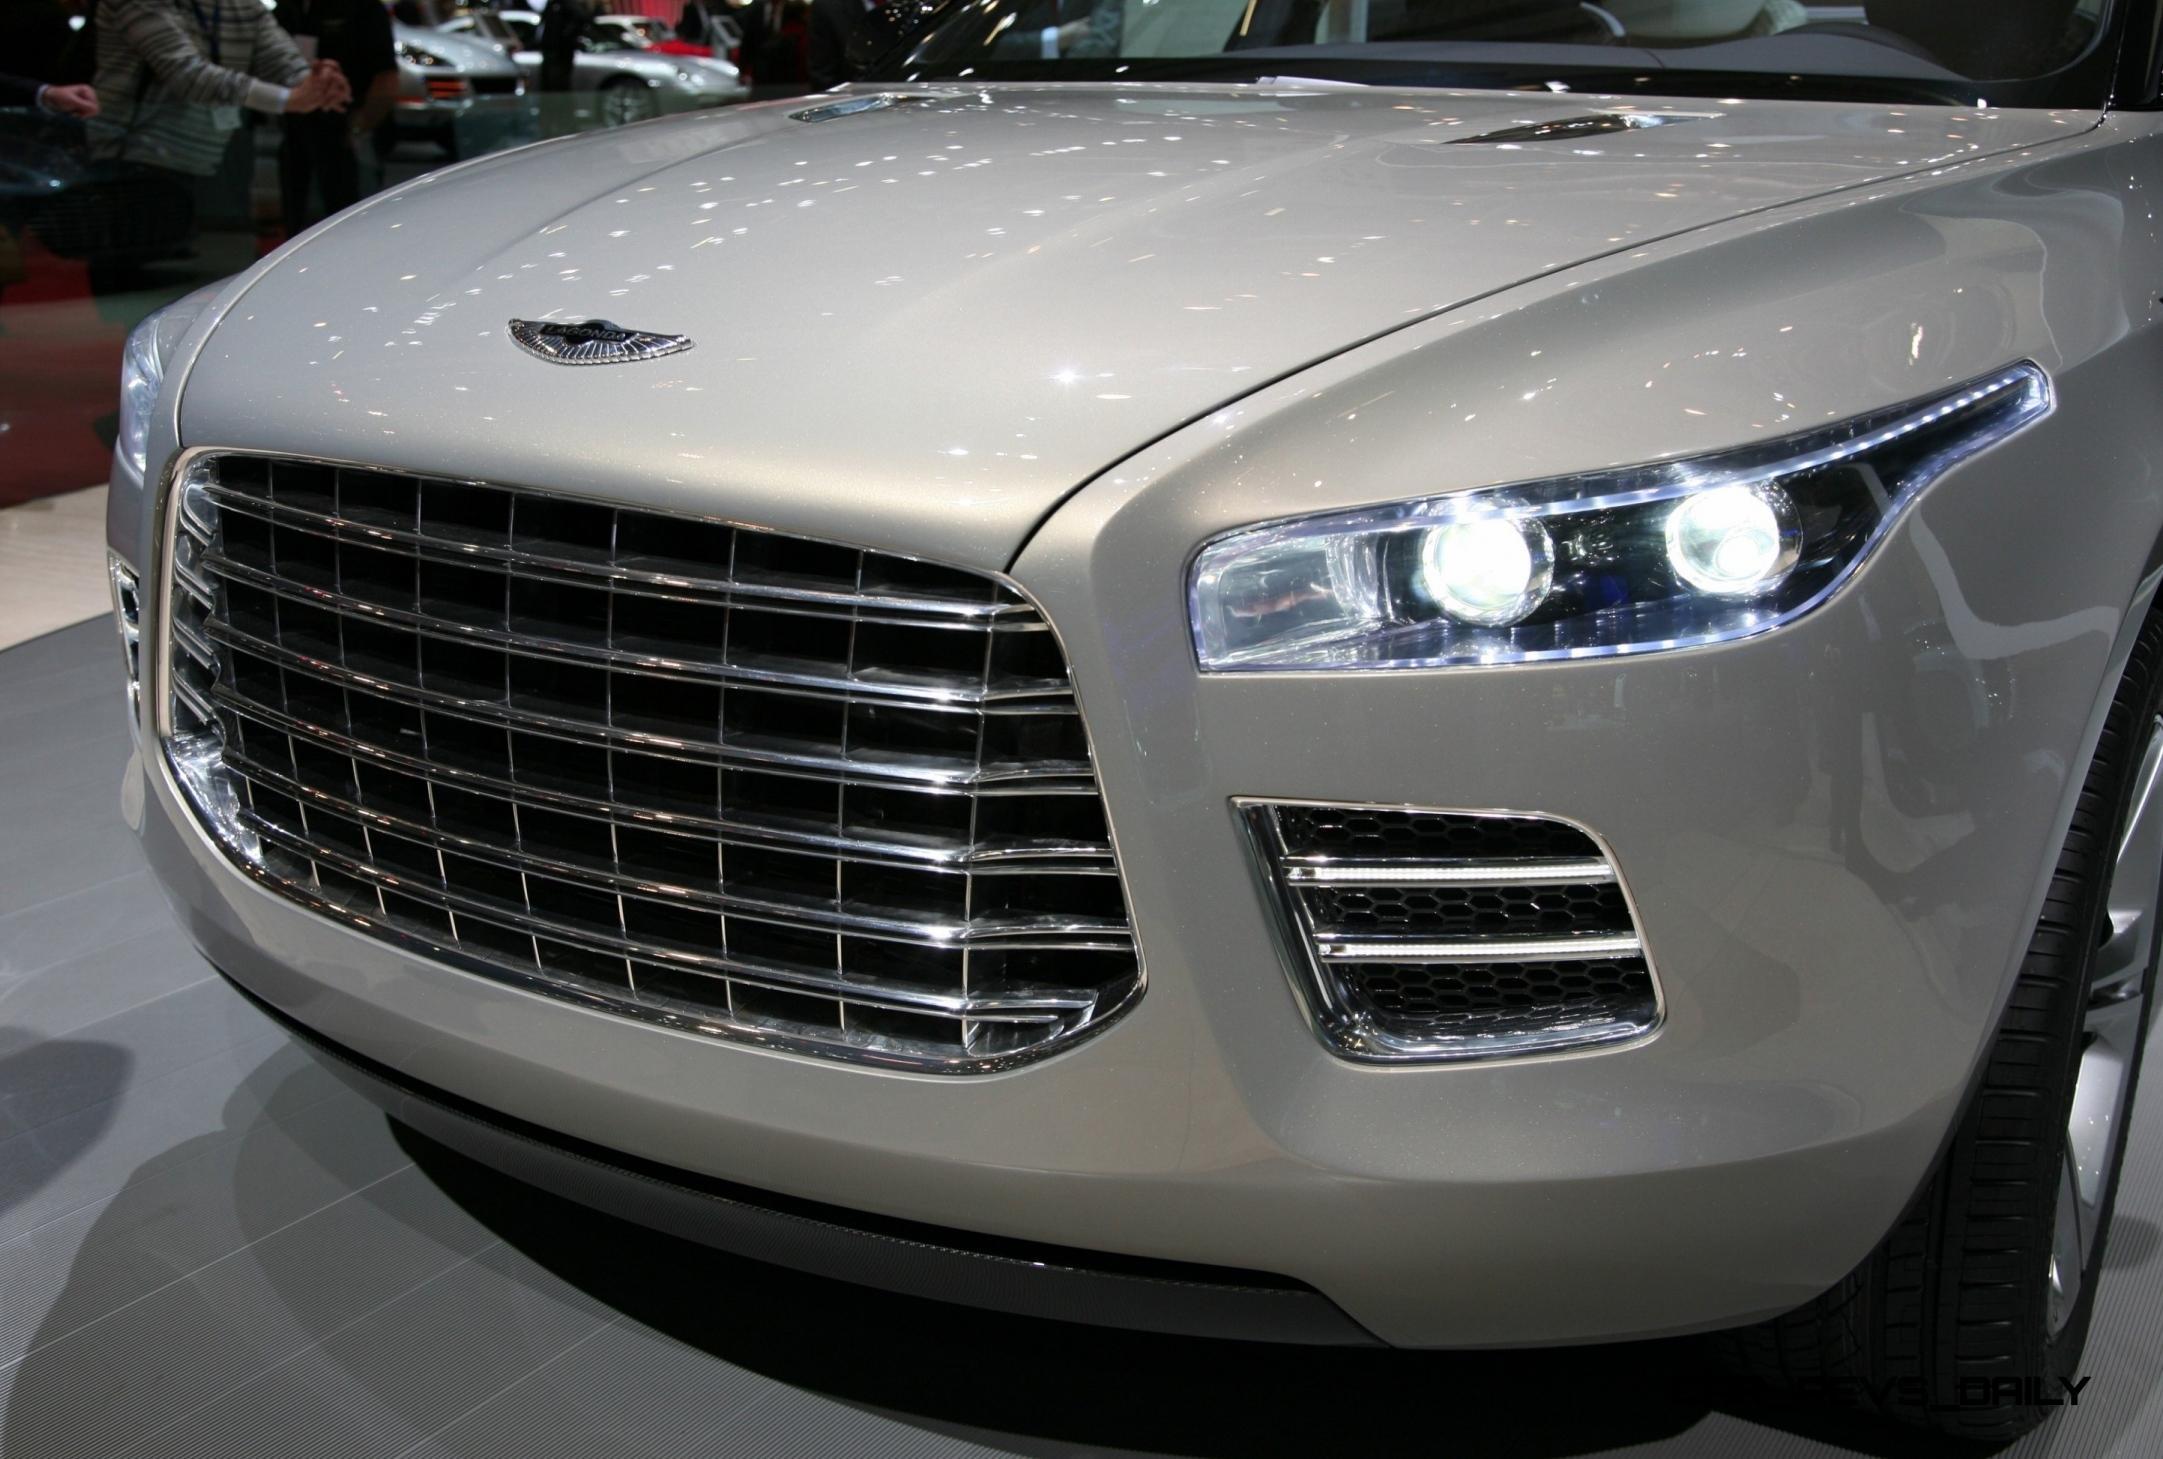 Digital Renderings Fix the 2009 Aston Martin LAGONDA SUV Concept